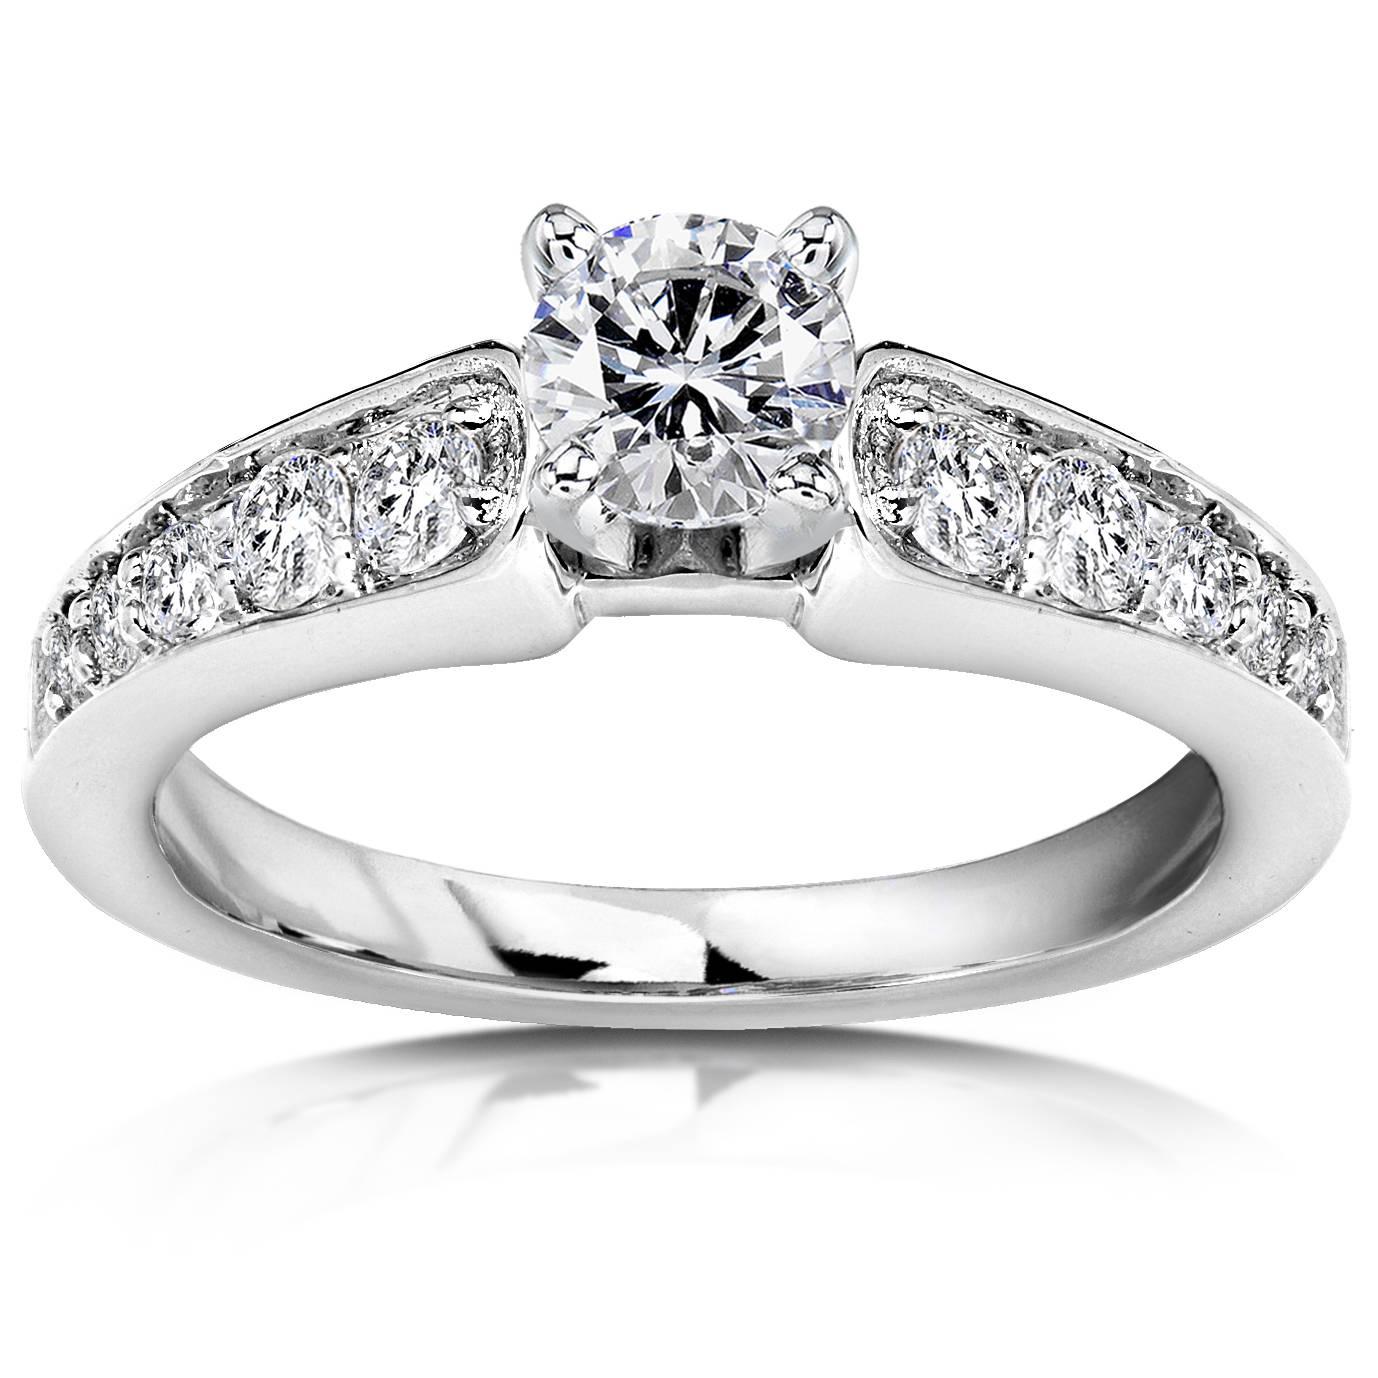 3 4ct Diamond Engagement Ring 14K White Gold